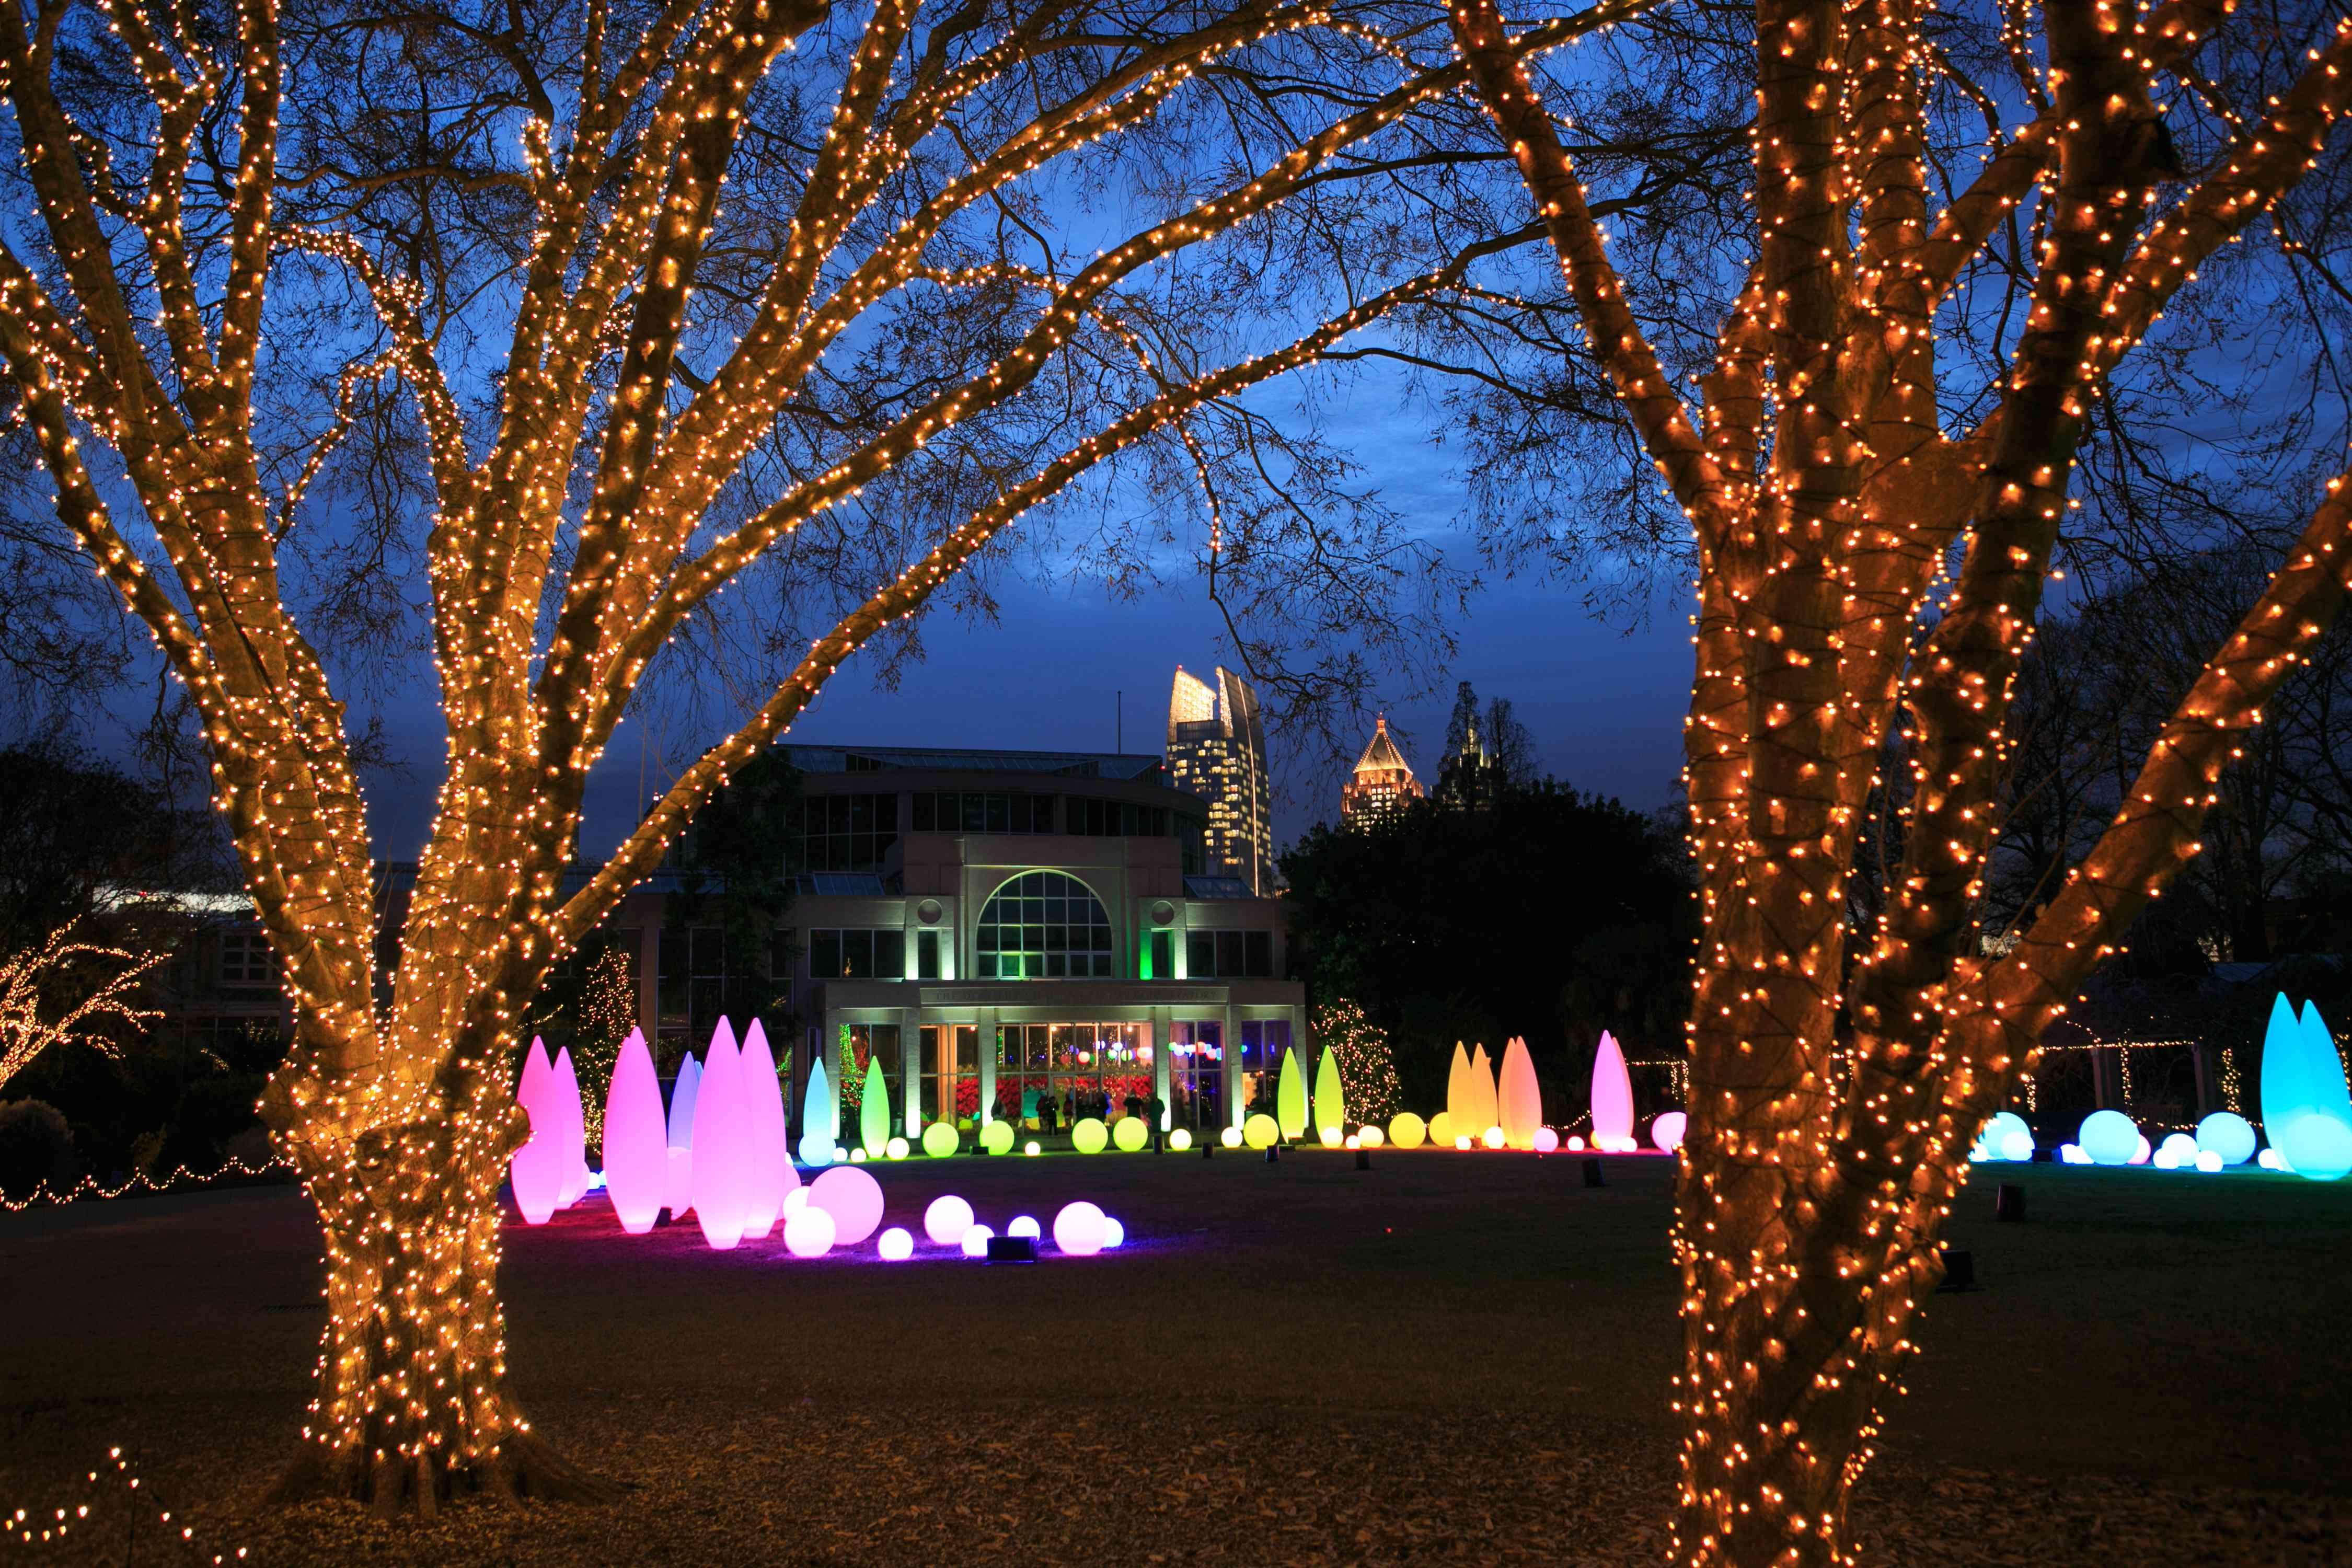 Garden Nights, Holiday Lights at the Atlanta Botanical Garden